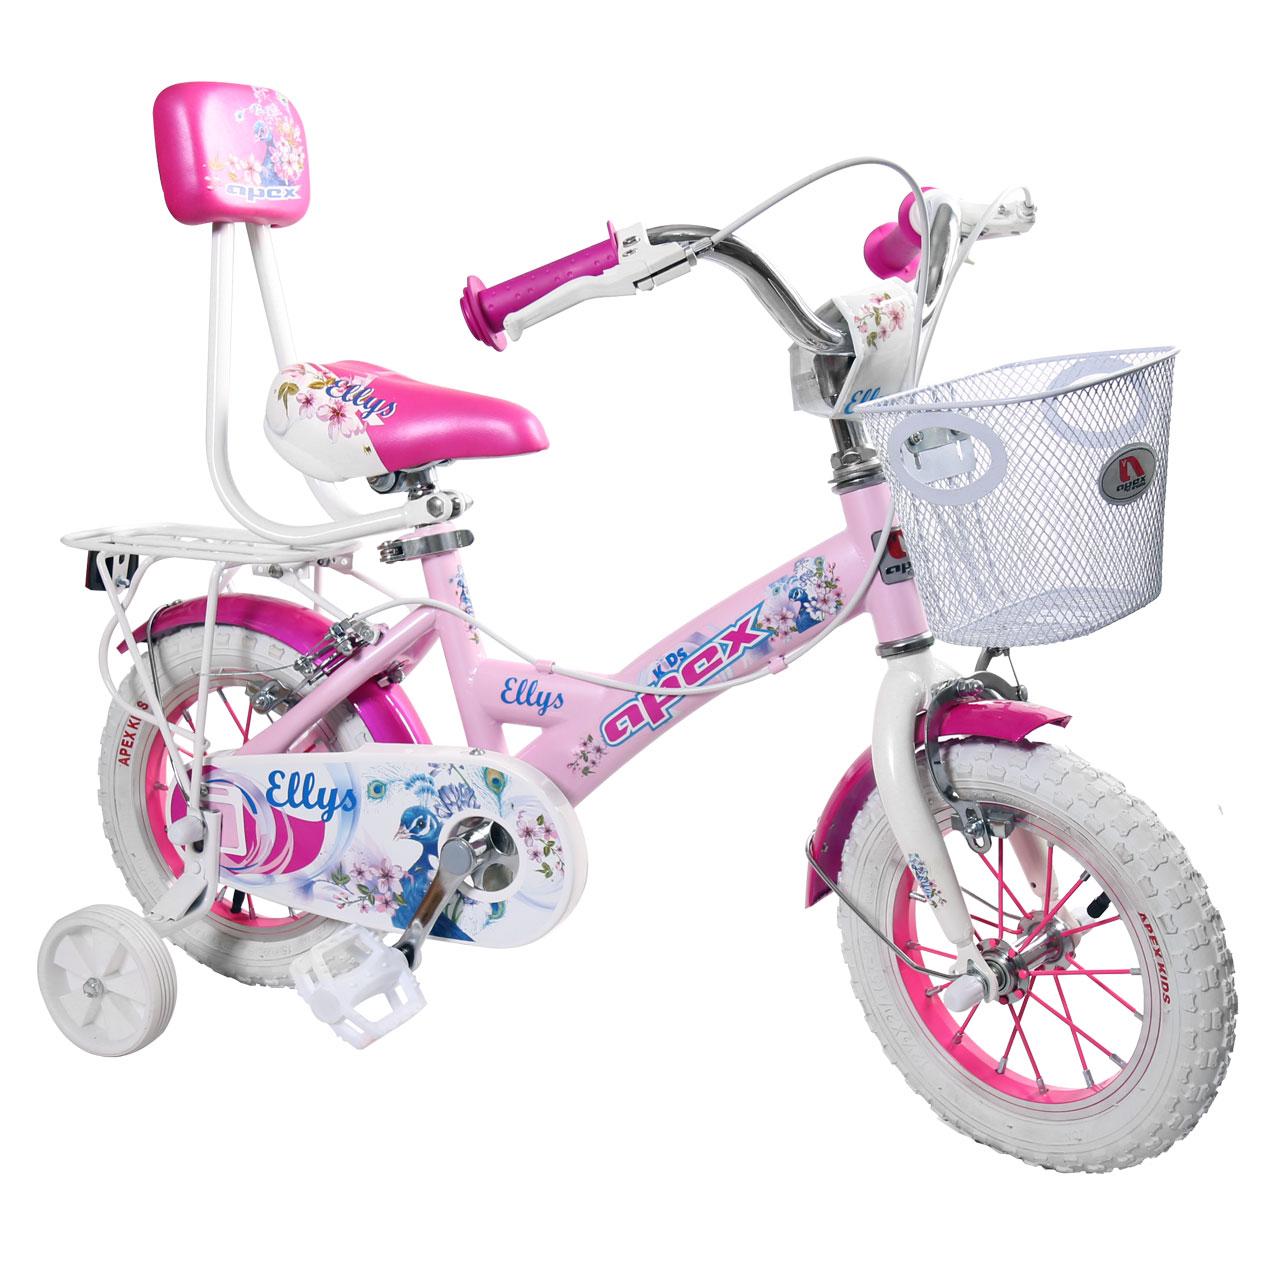 دوچرخه اپکس مدل Ellys PK سایز 12